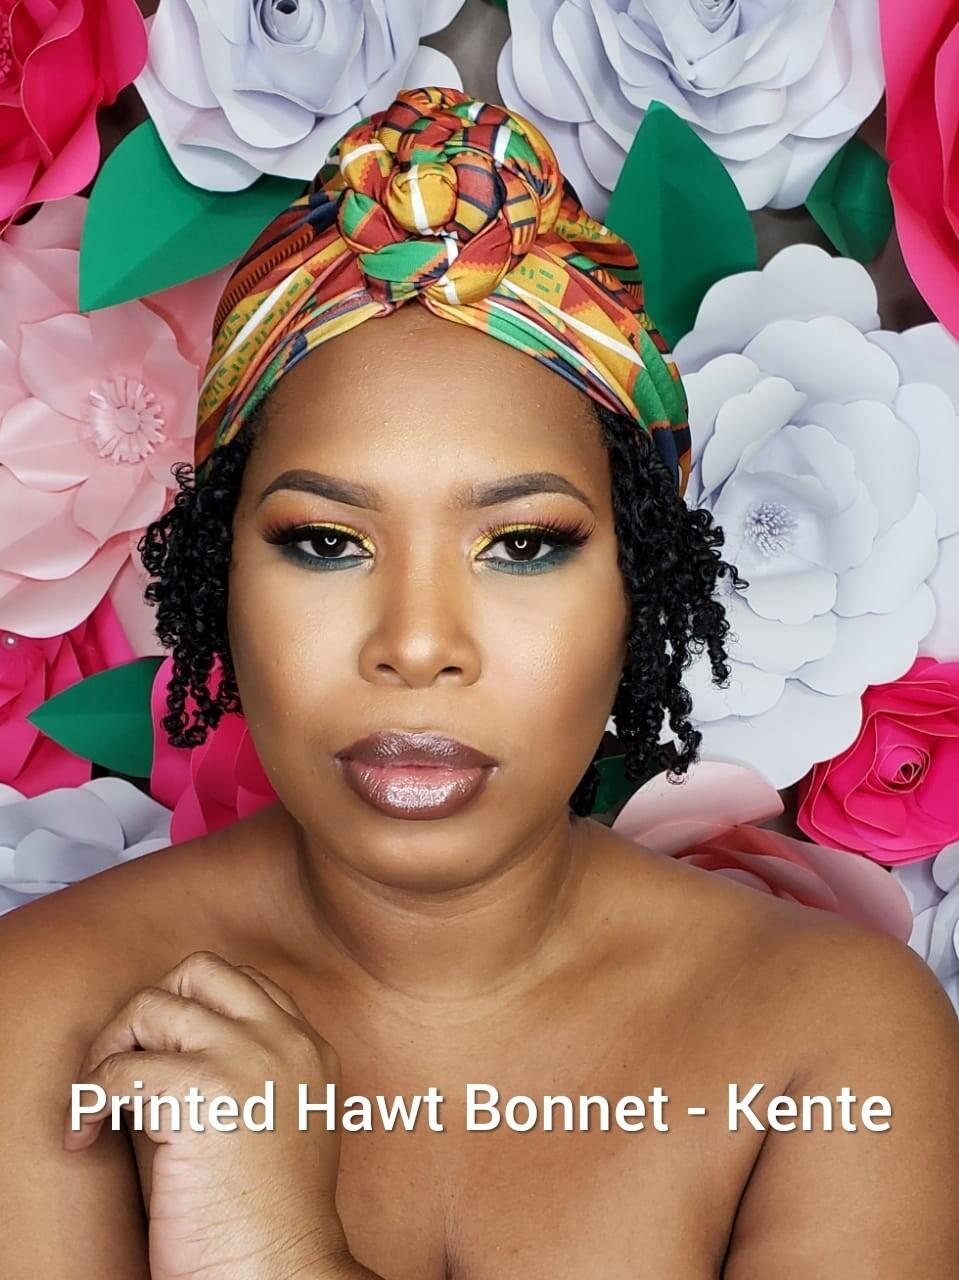 Printed Hawt Bonnets